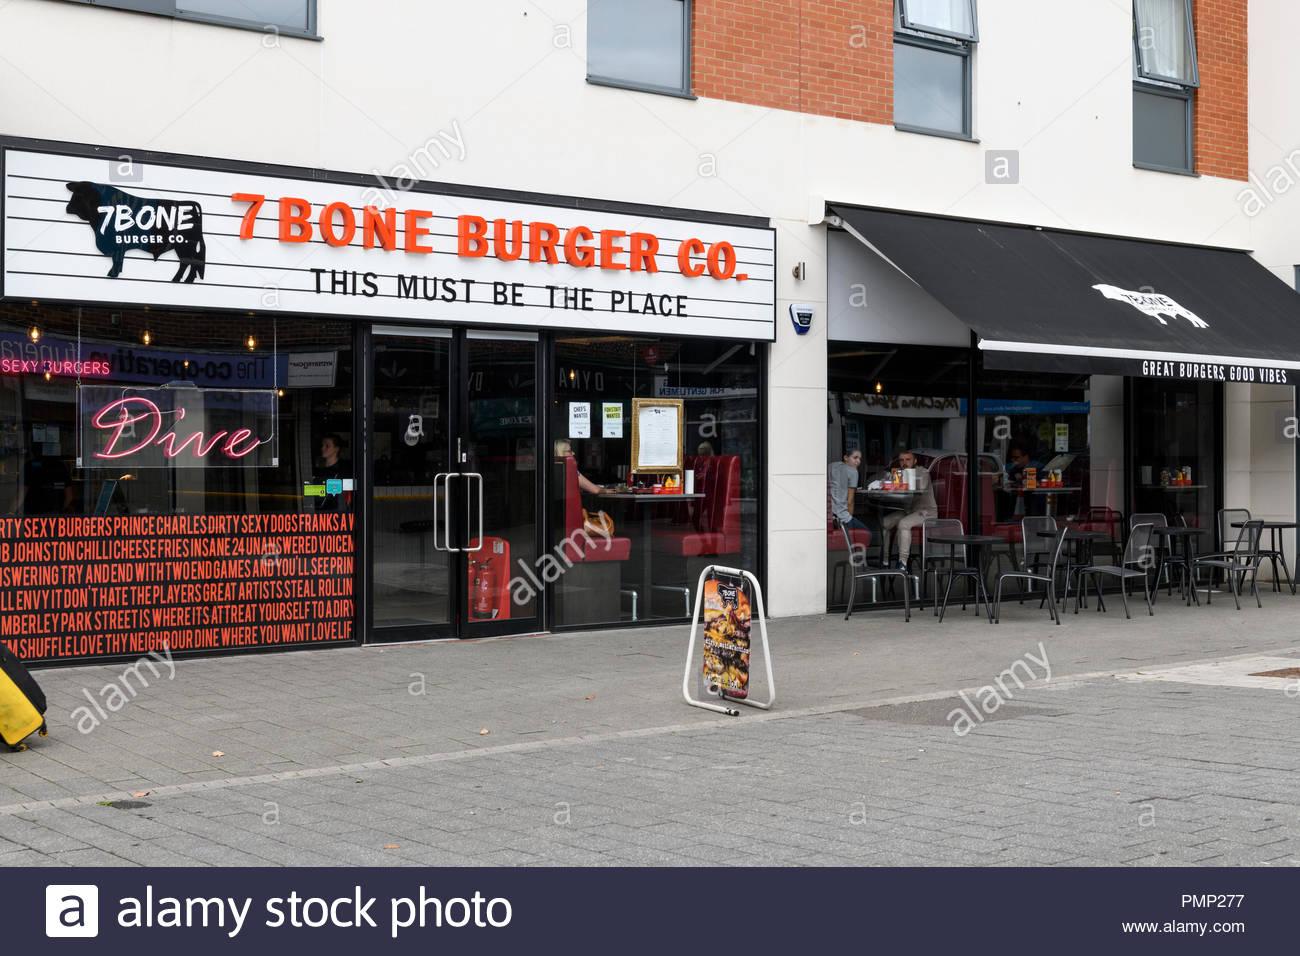 7 Bone Burger Co, Park Street, Camberley, Surrey, England, UK - Stock Image